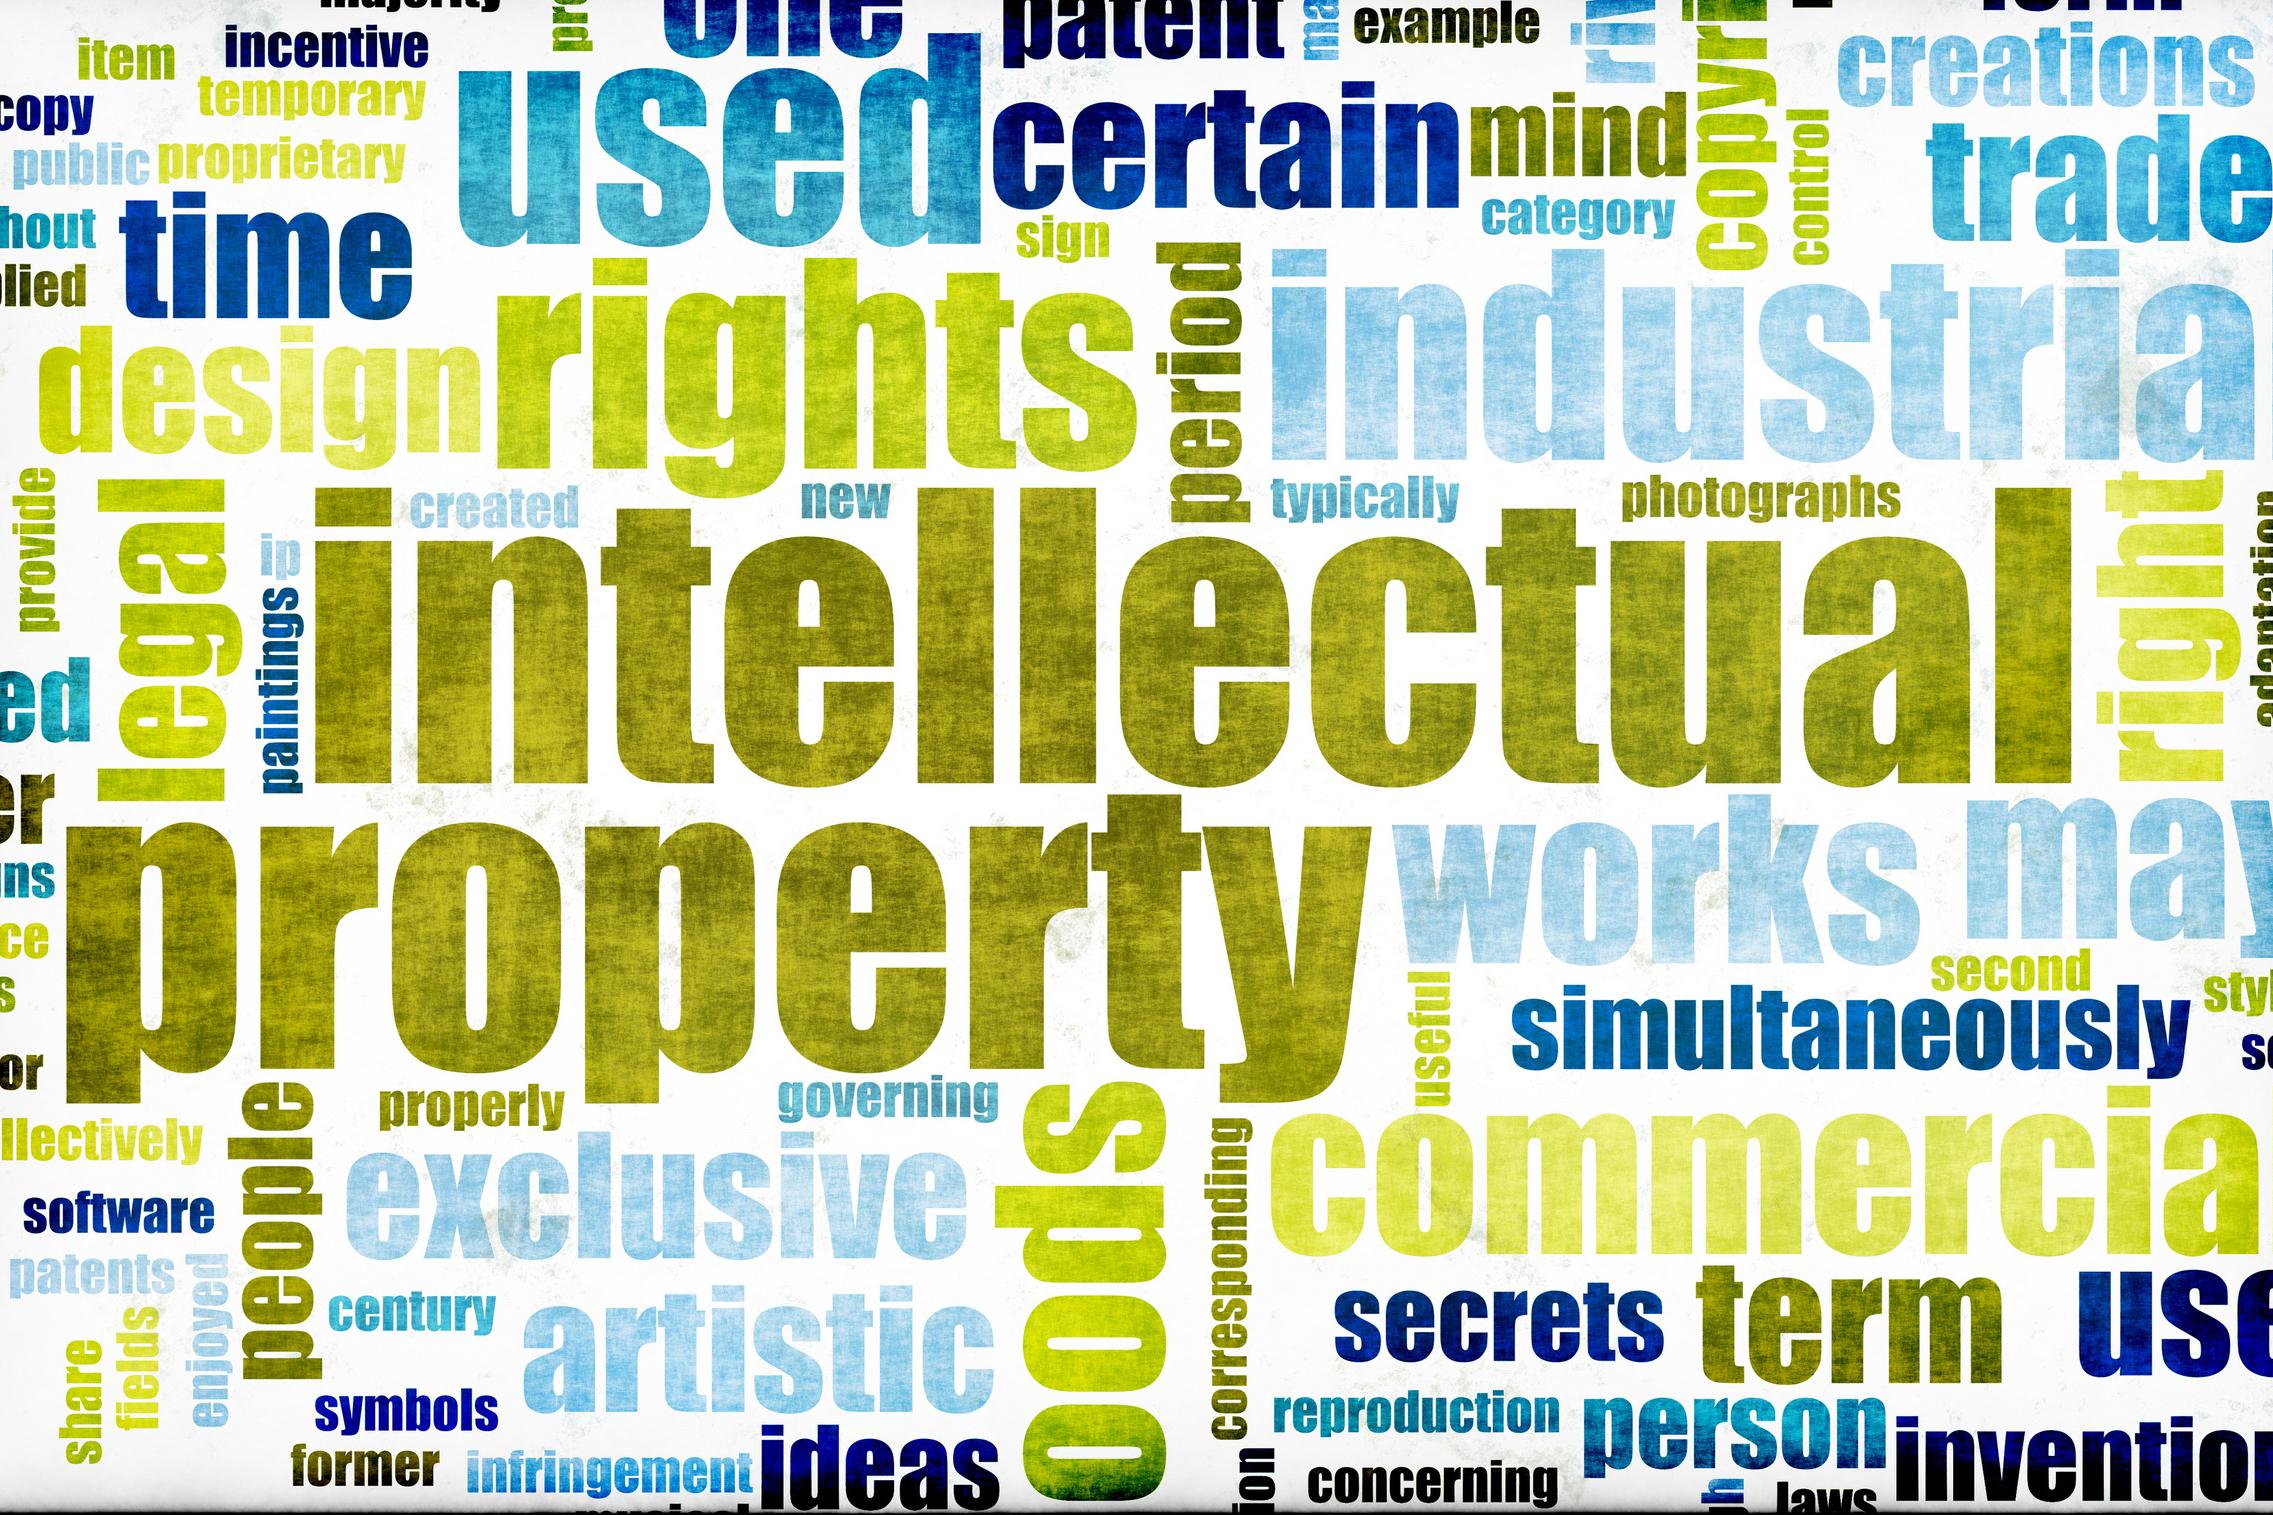 Protecting Trade Secrets Through Intellectual Property ...